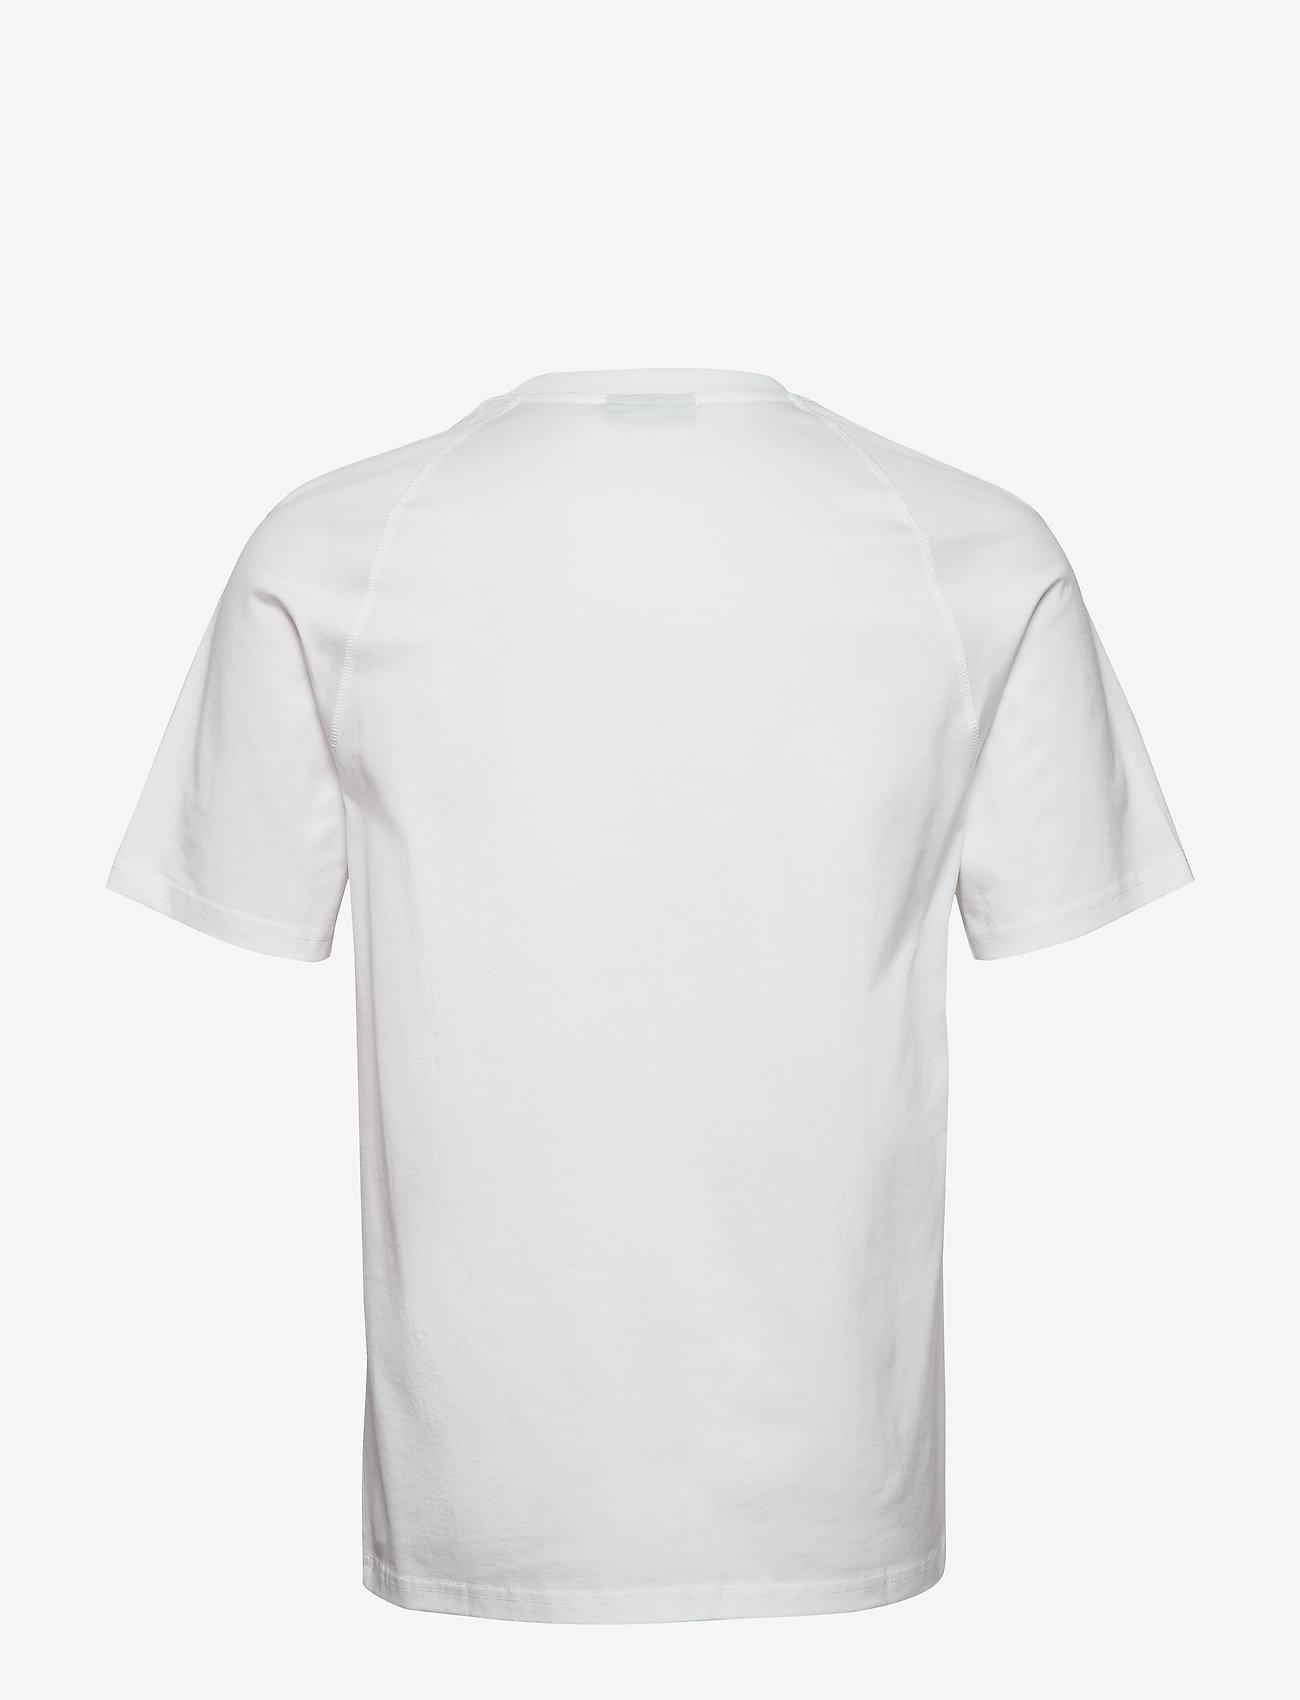 J. Lindeberg - Jordan Bridge t-shirt cotton - basic t-shirts - white - 1